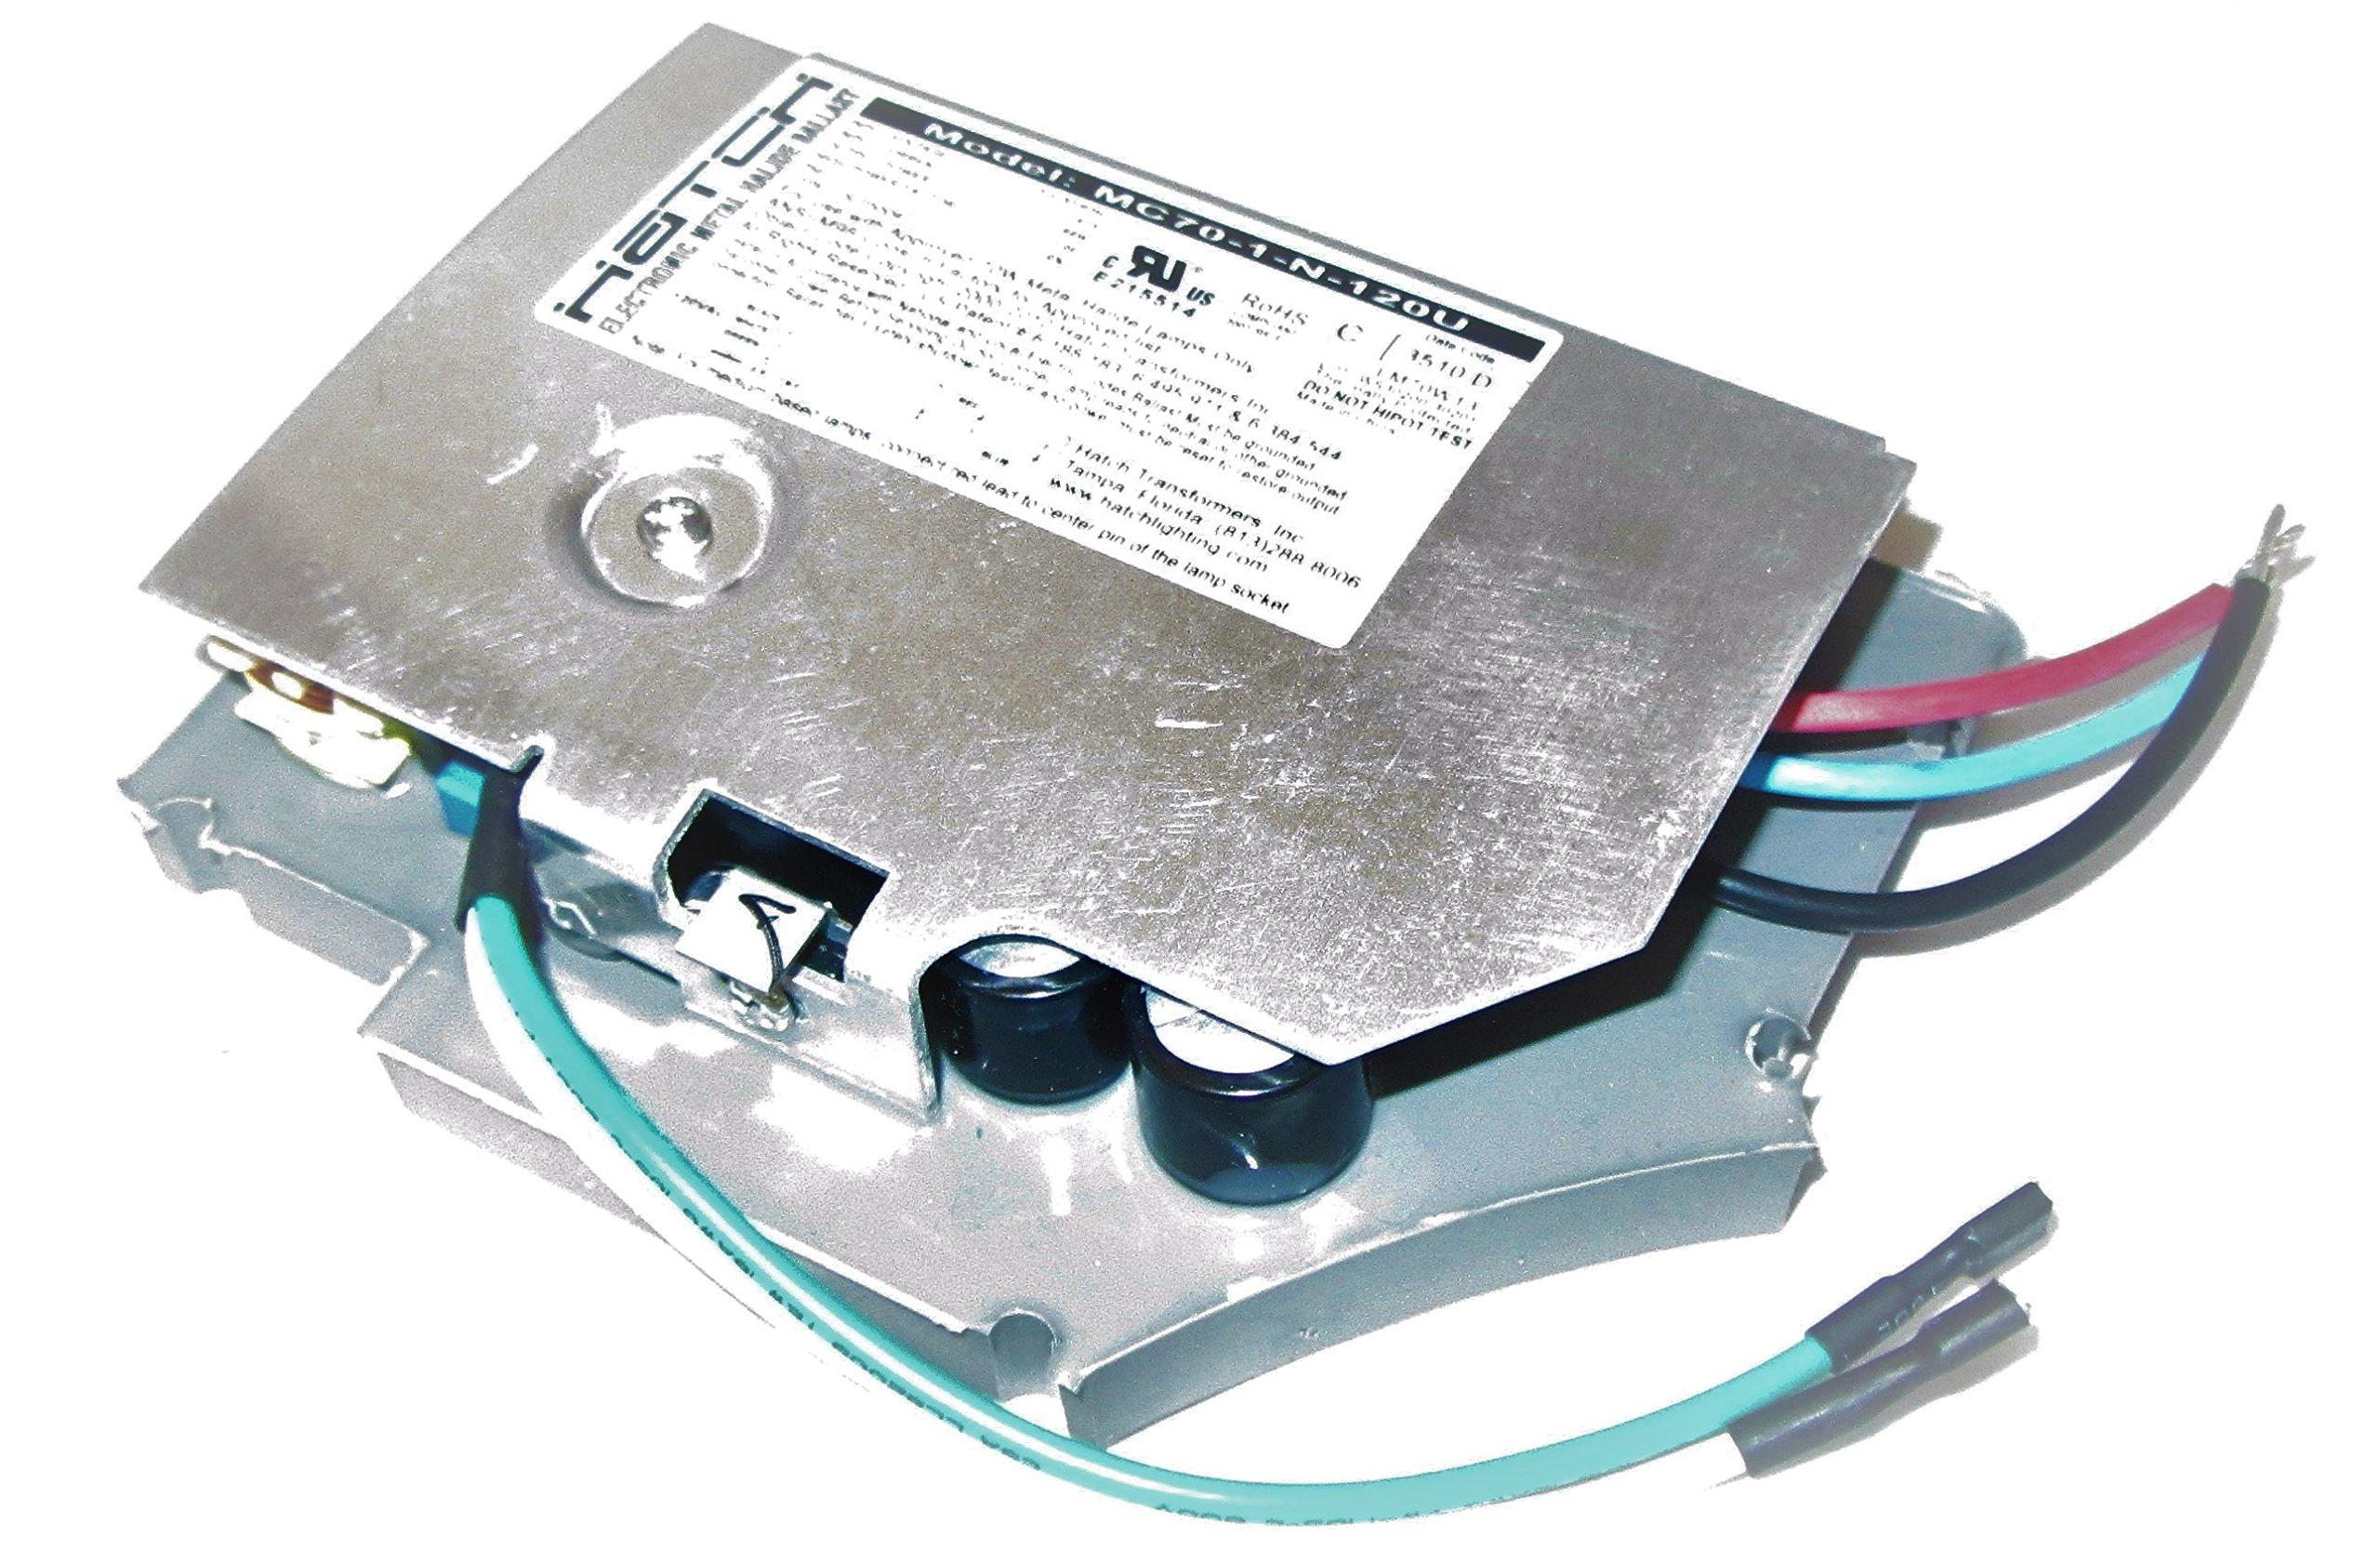 HATCH MC70-1-N-120U 70W 120V Electronic Metal Halide Ballast ANSI-M98 120 Volt 50/60Hz